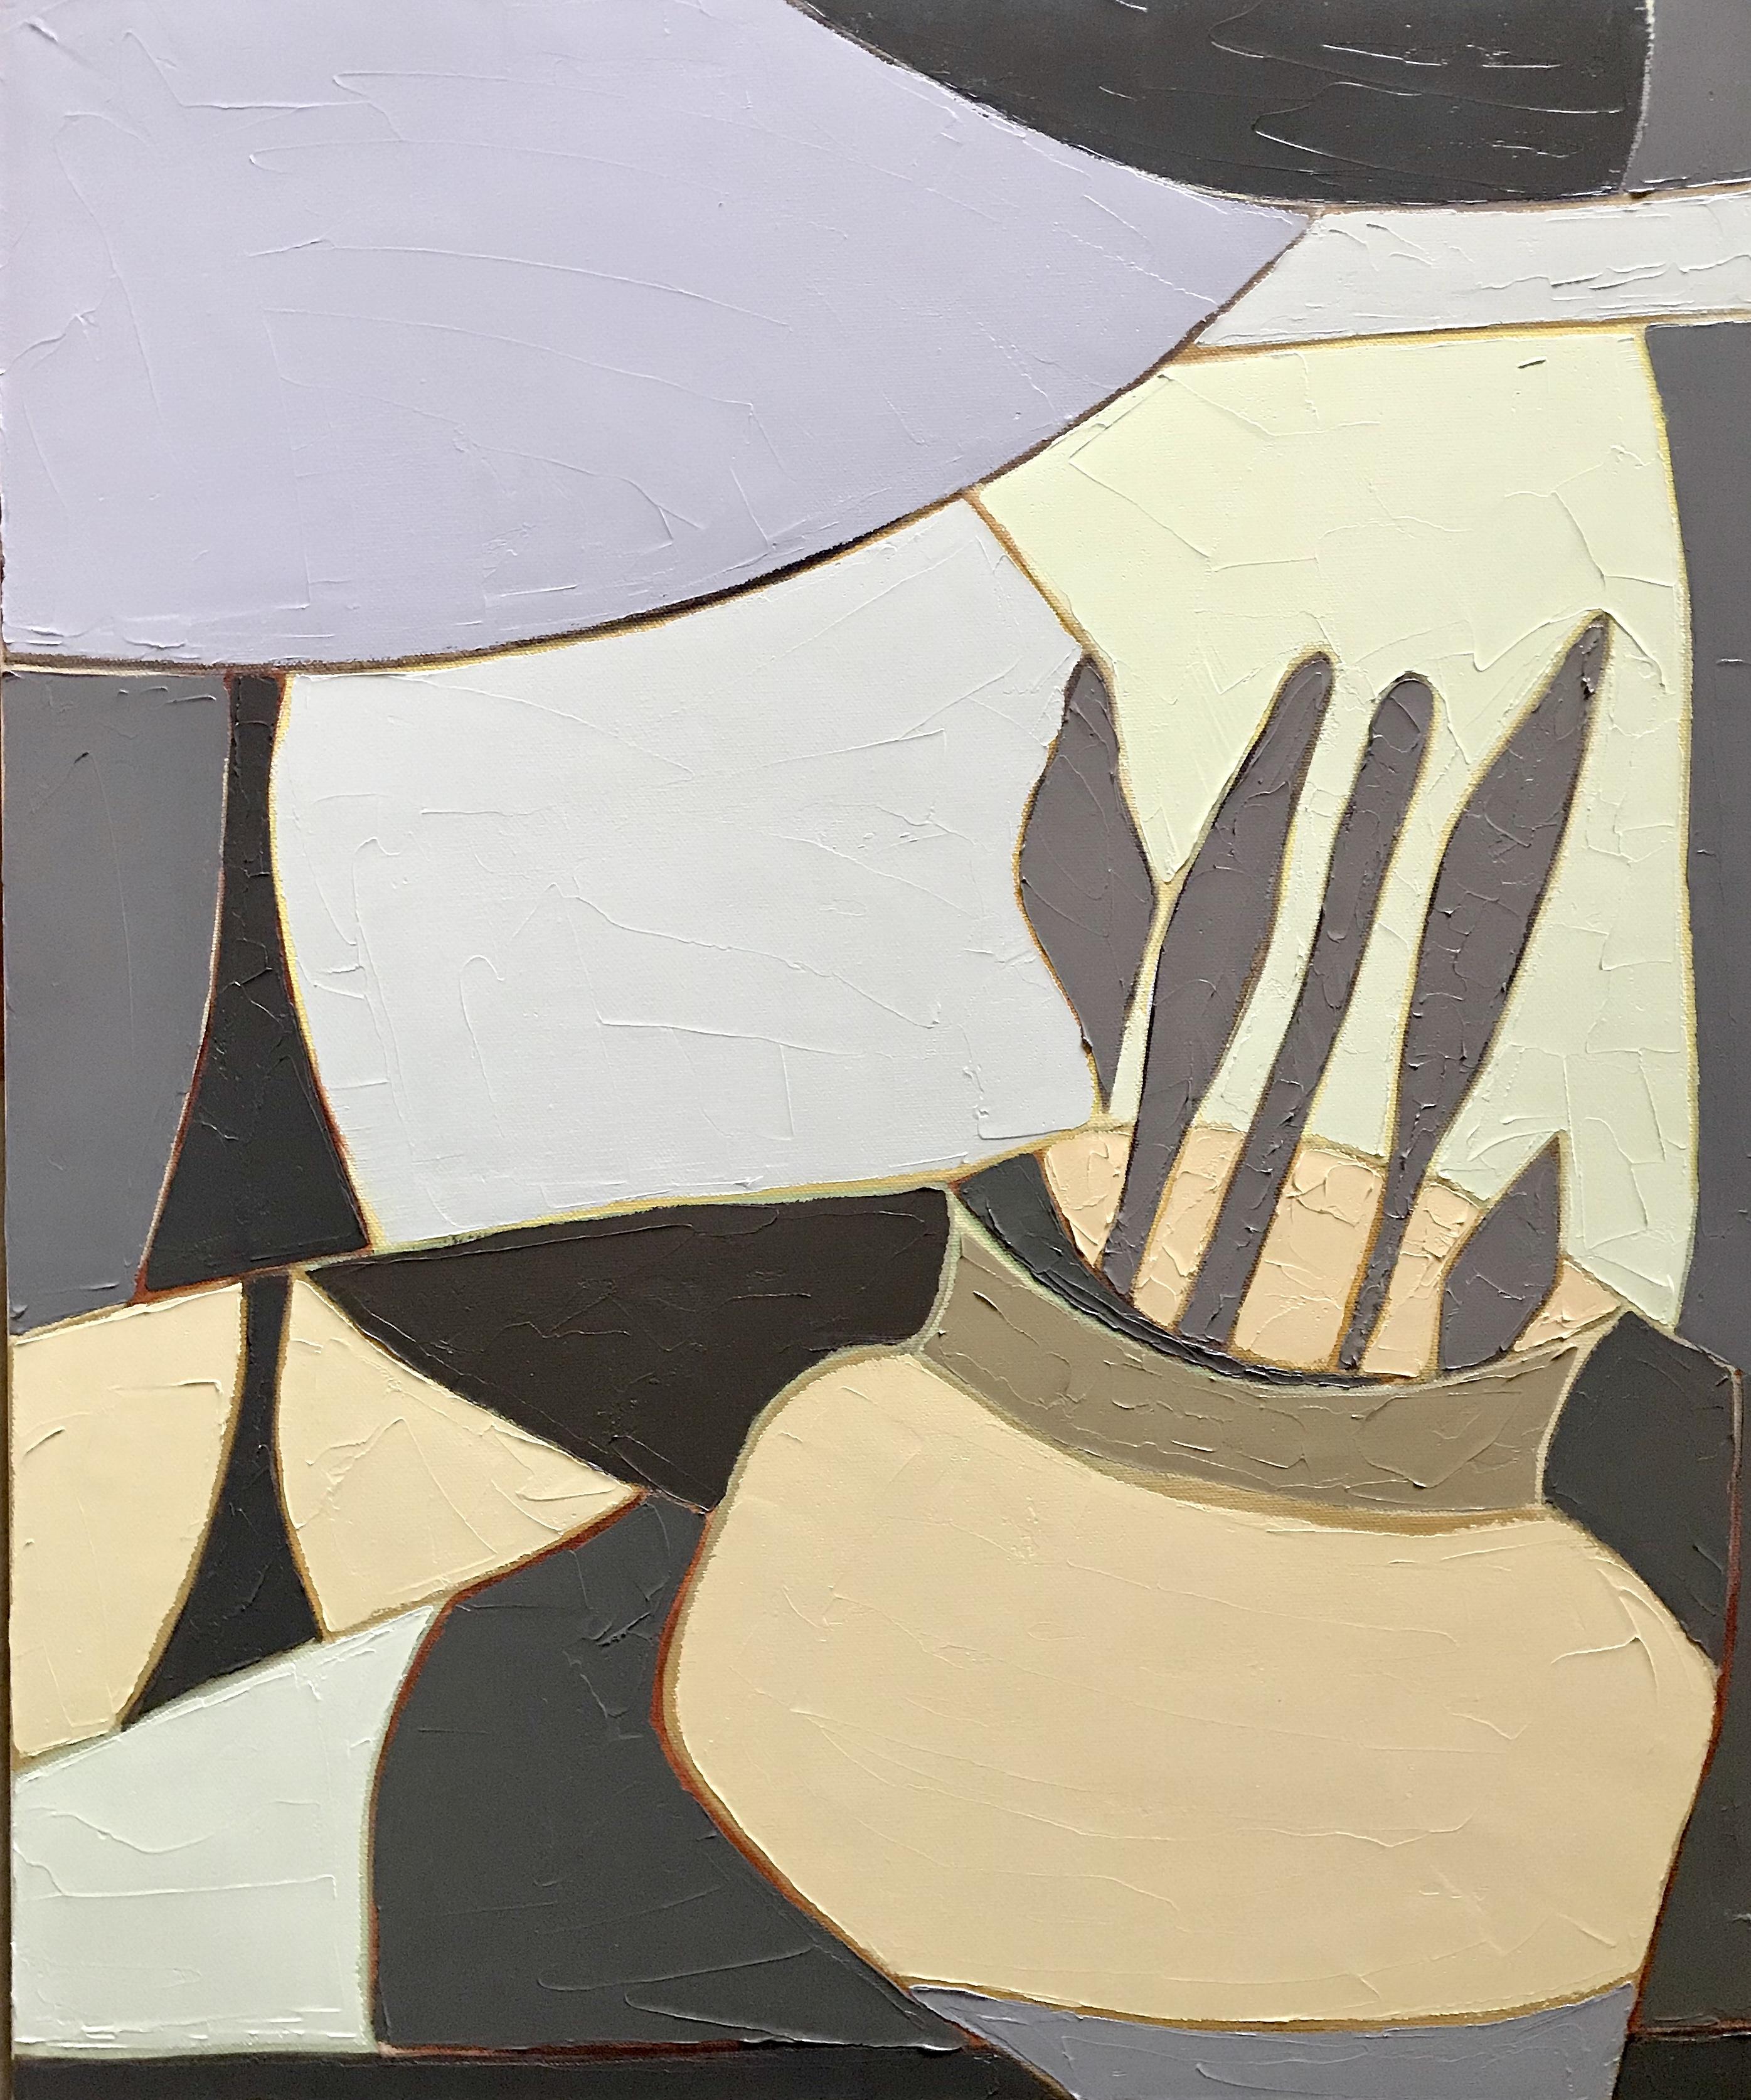 Pallet Knives in Scott's Pot (sold)